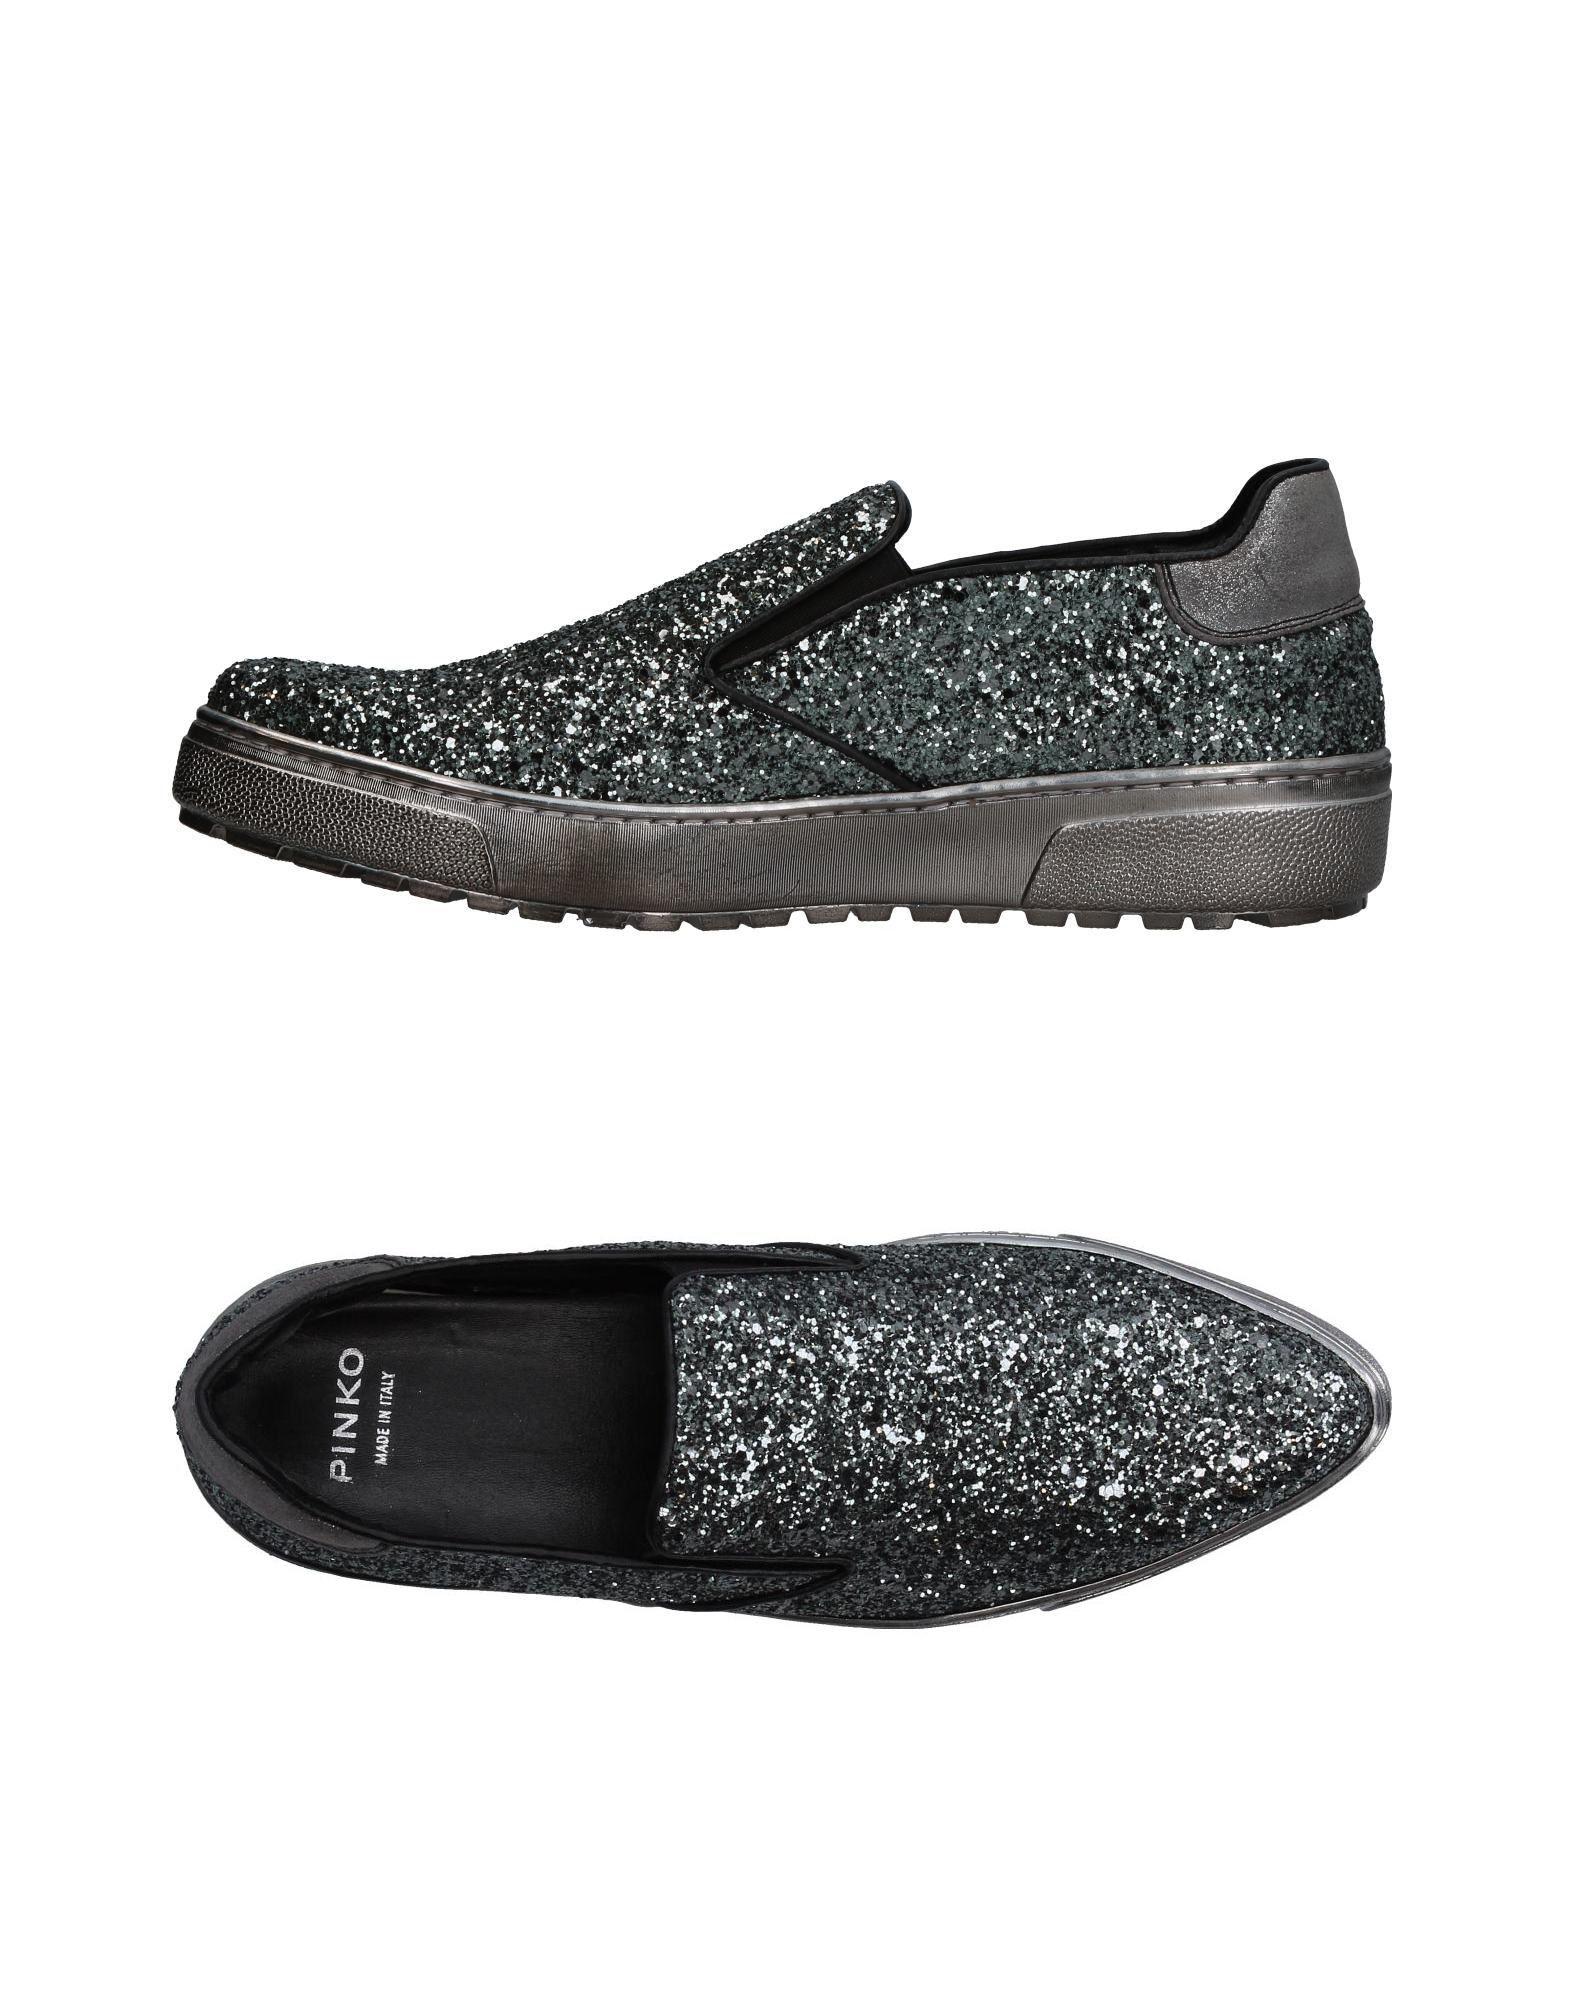 Moda Sneakers Pinko Donna - 11362653JV